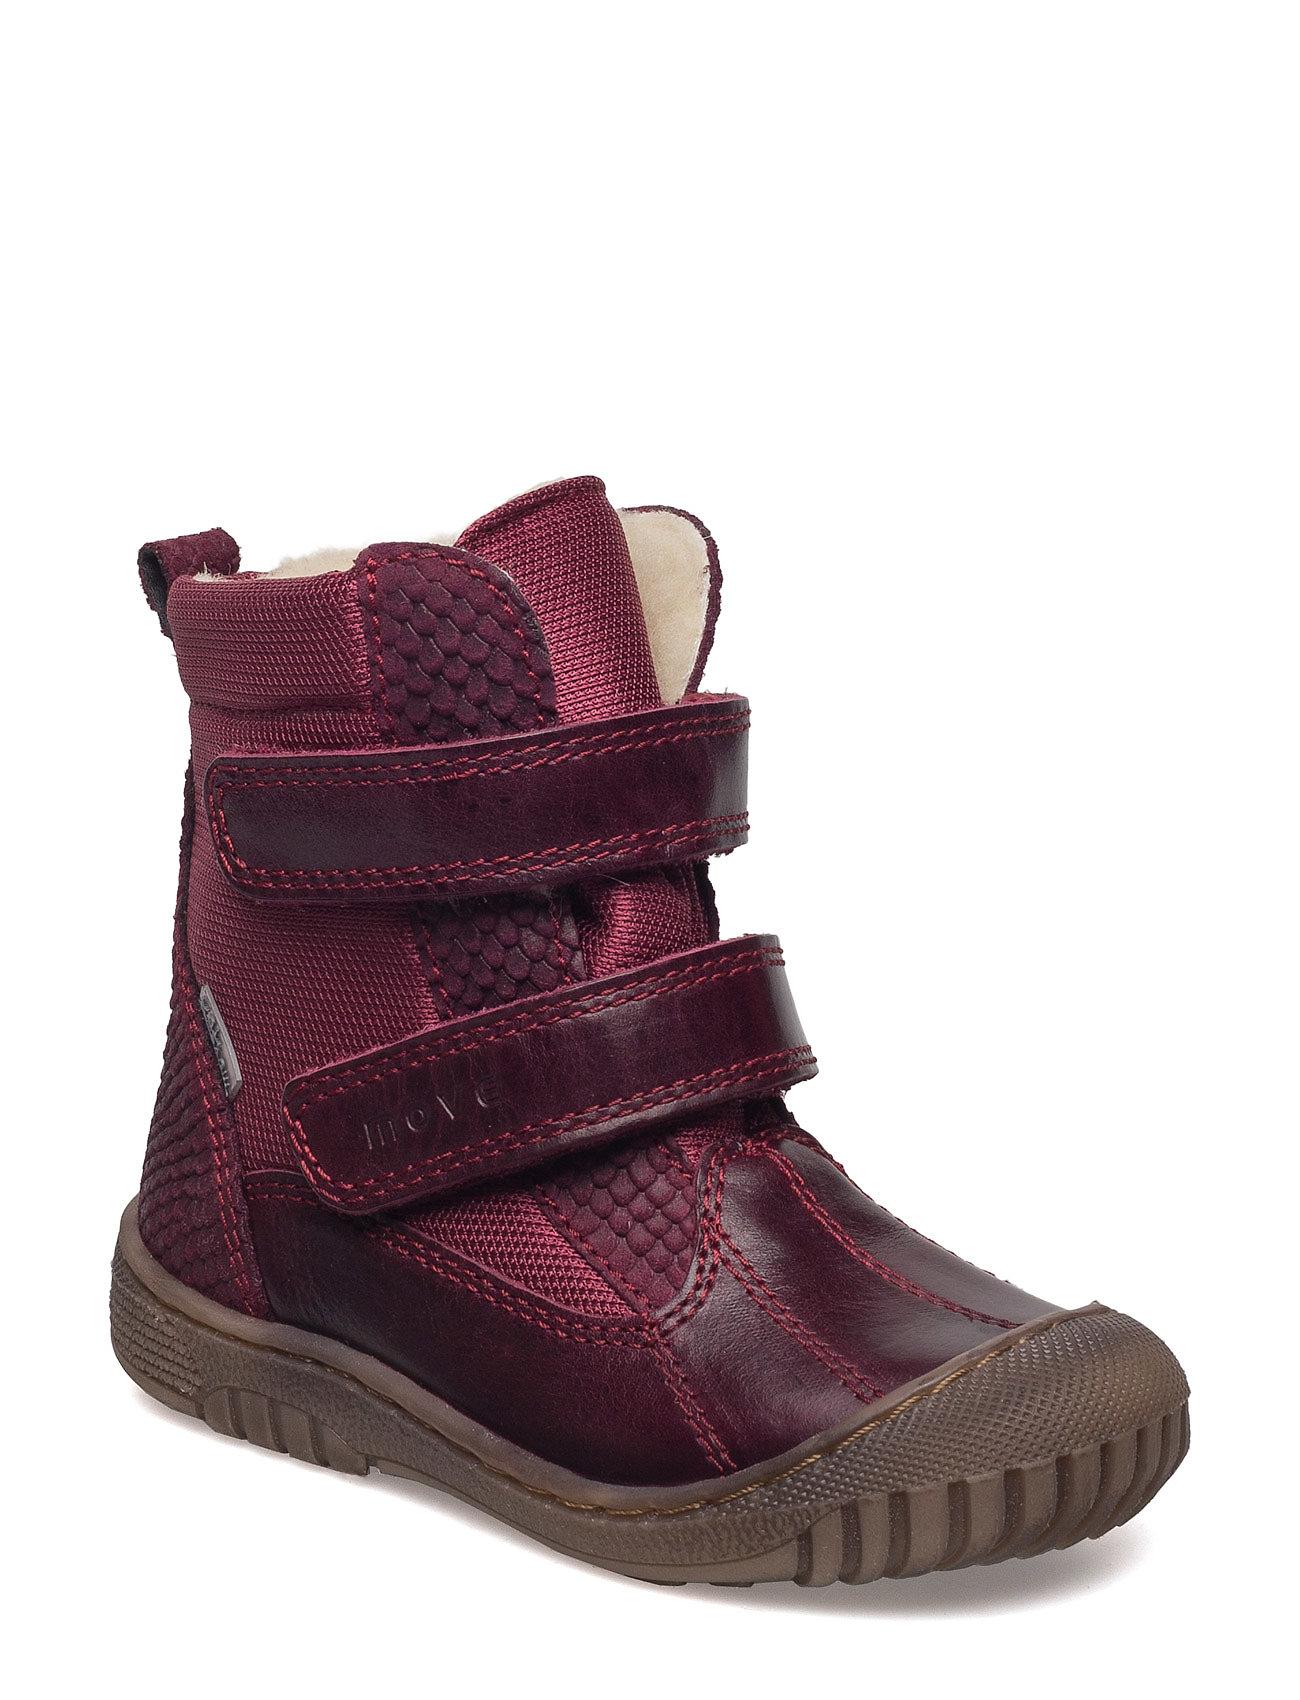 Infant - Tex Boot With Velcro Move by Melton Støvler til Børn i